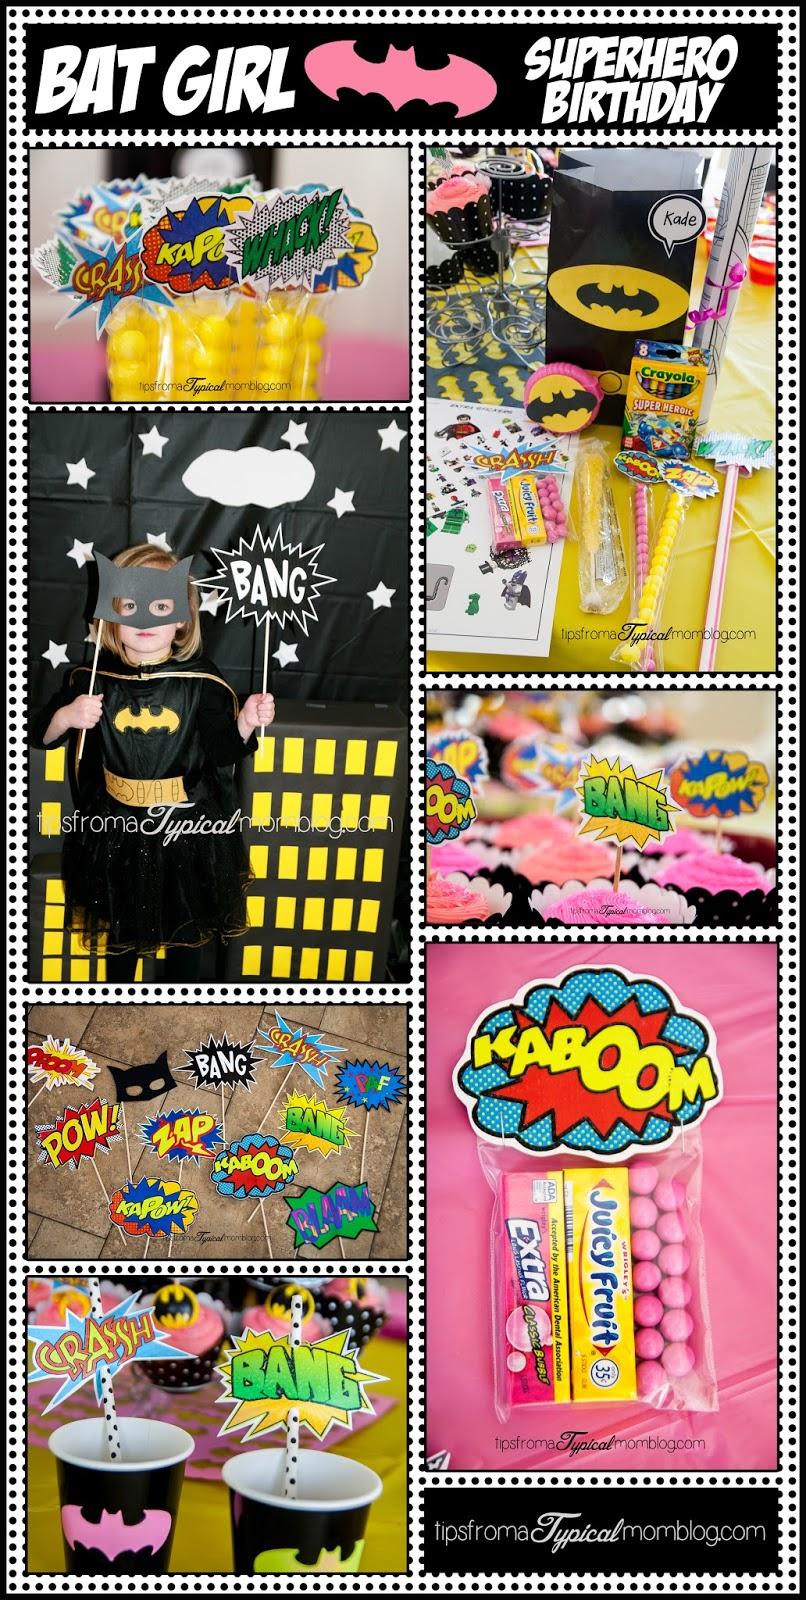 Superhero Girl Birthday Party Ideas And Free Printables